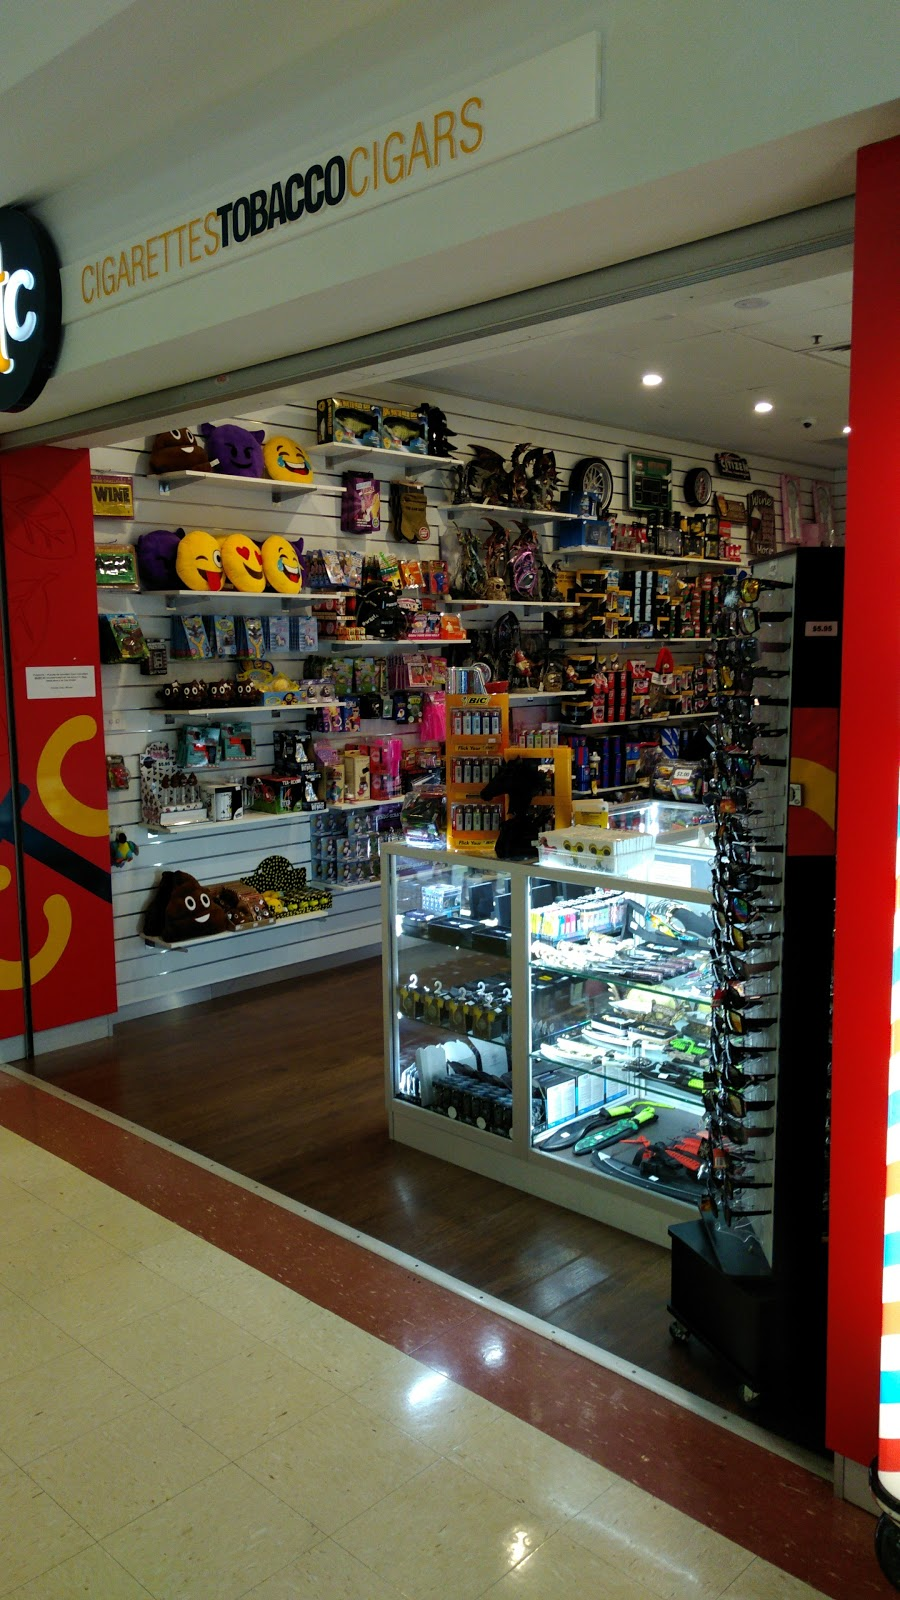 CTC Thornton | store | Thornton Shopping Centre, Shop, 25/1 Taylor Ave, Thornton NSW 2322, Australia | 0249660495 OR +61 2 4966 0495